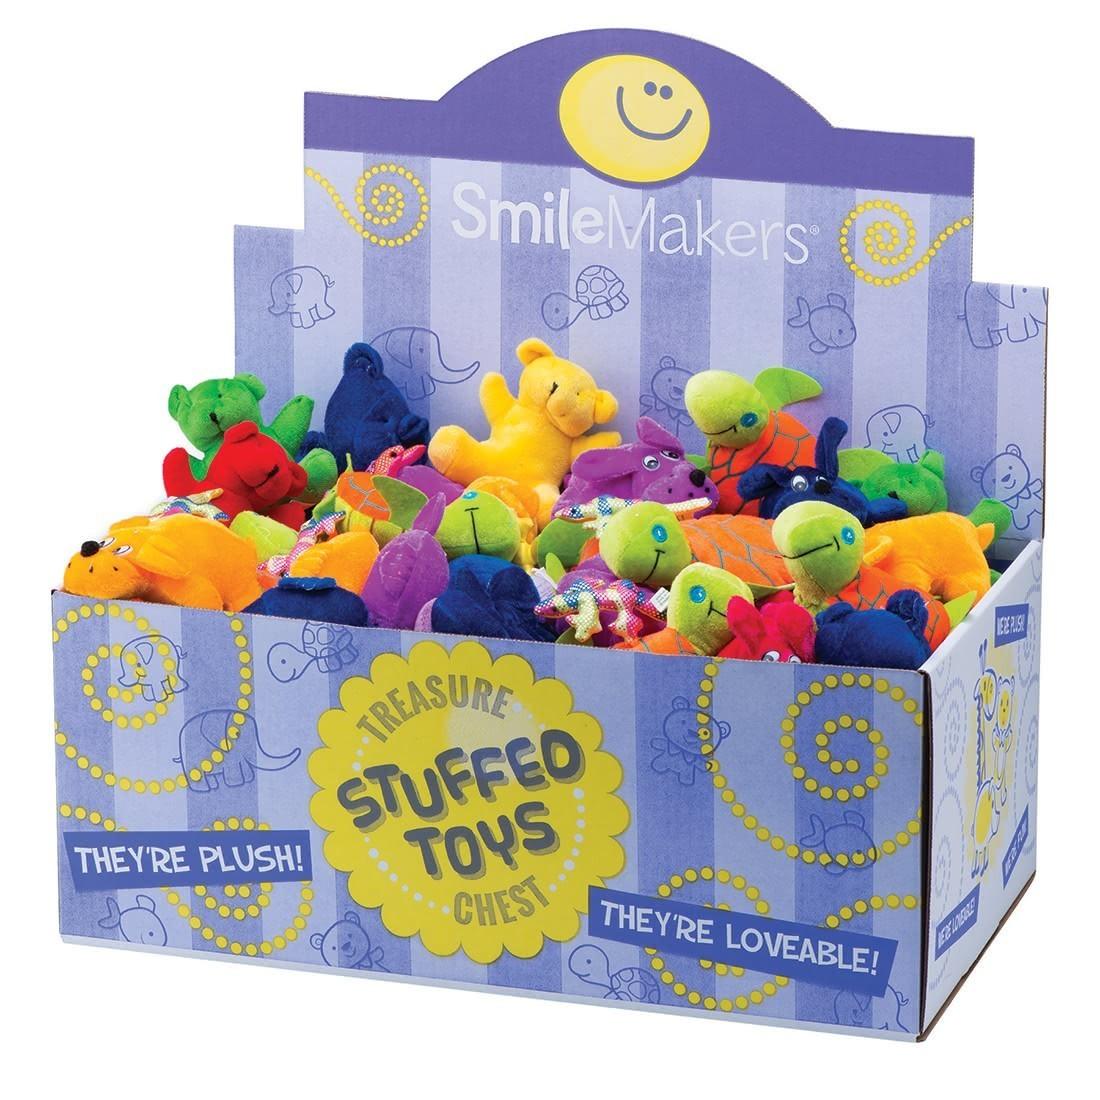 Stuffed Toy Treasure Chest [image]